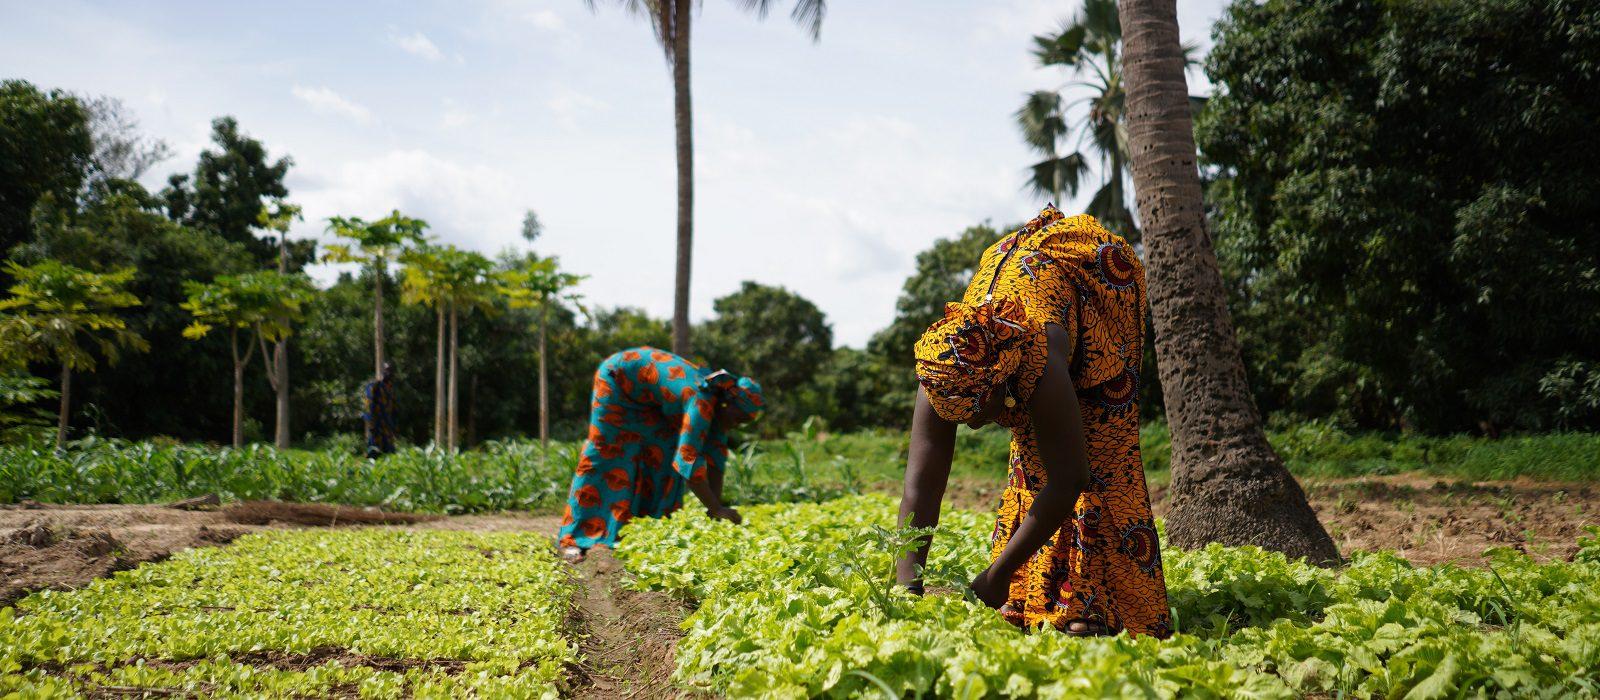 Two Women Farmers Weeding A Salad Garden In A West African Rural Community